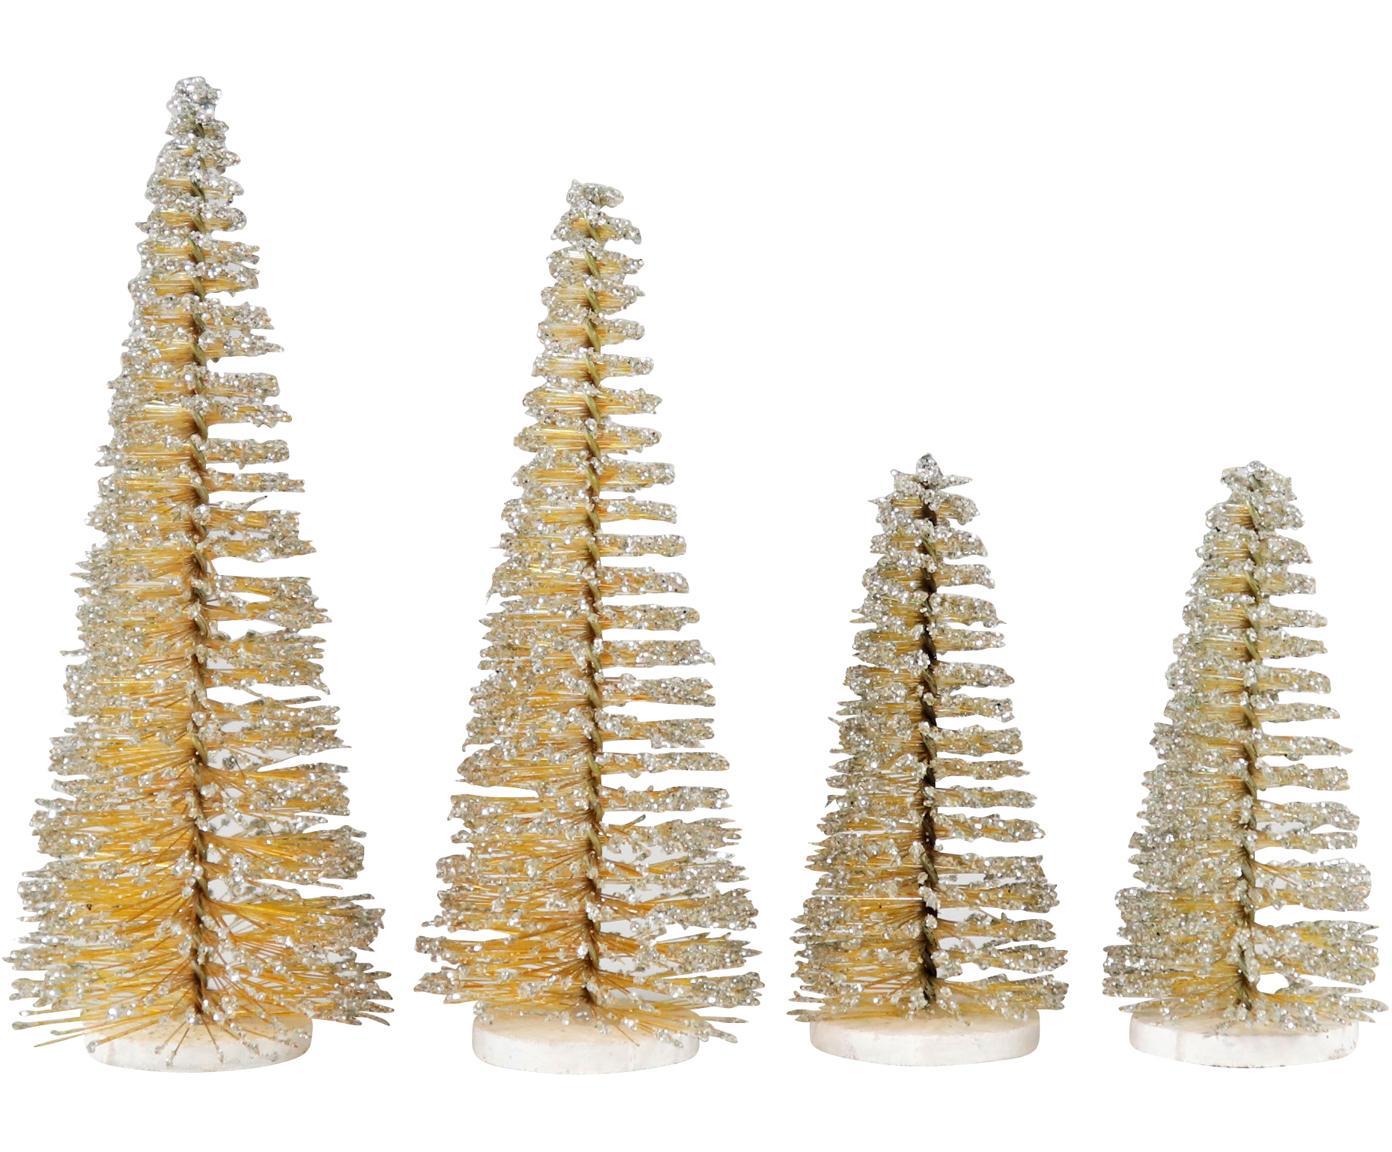 Deko-Objekt-Set Glam, 4-tlg., Kunststoff, Metall, Goldfarben, Sondergrößen